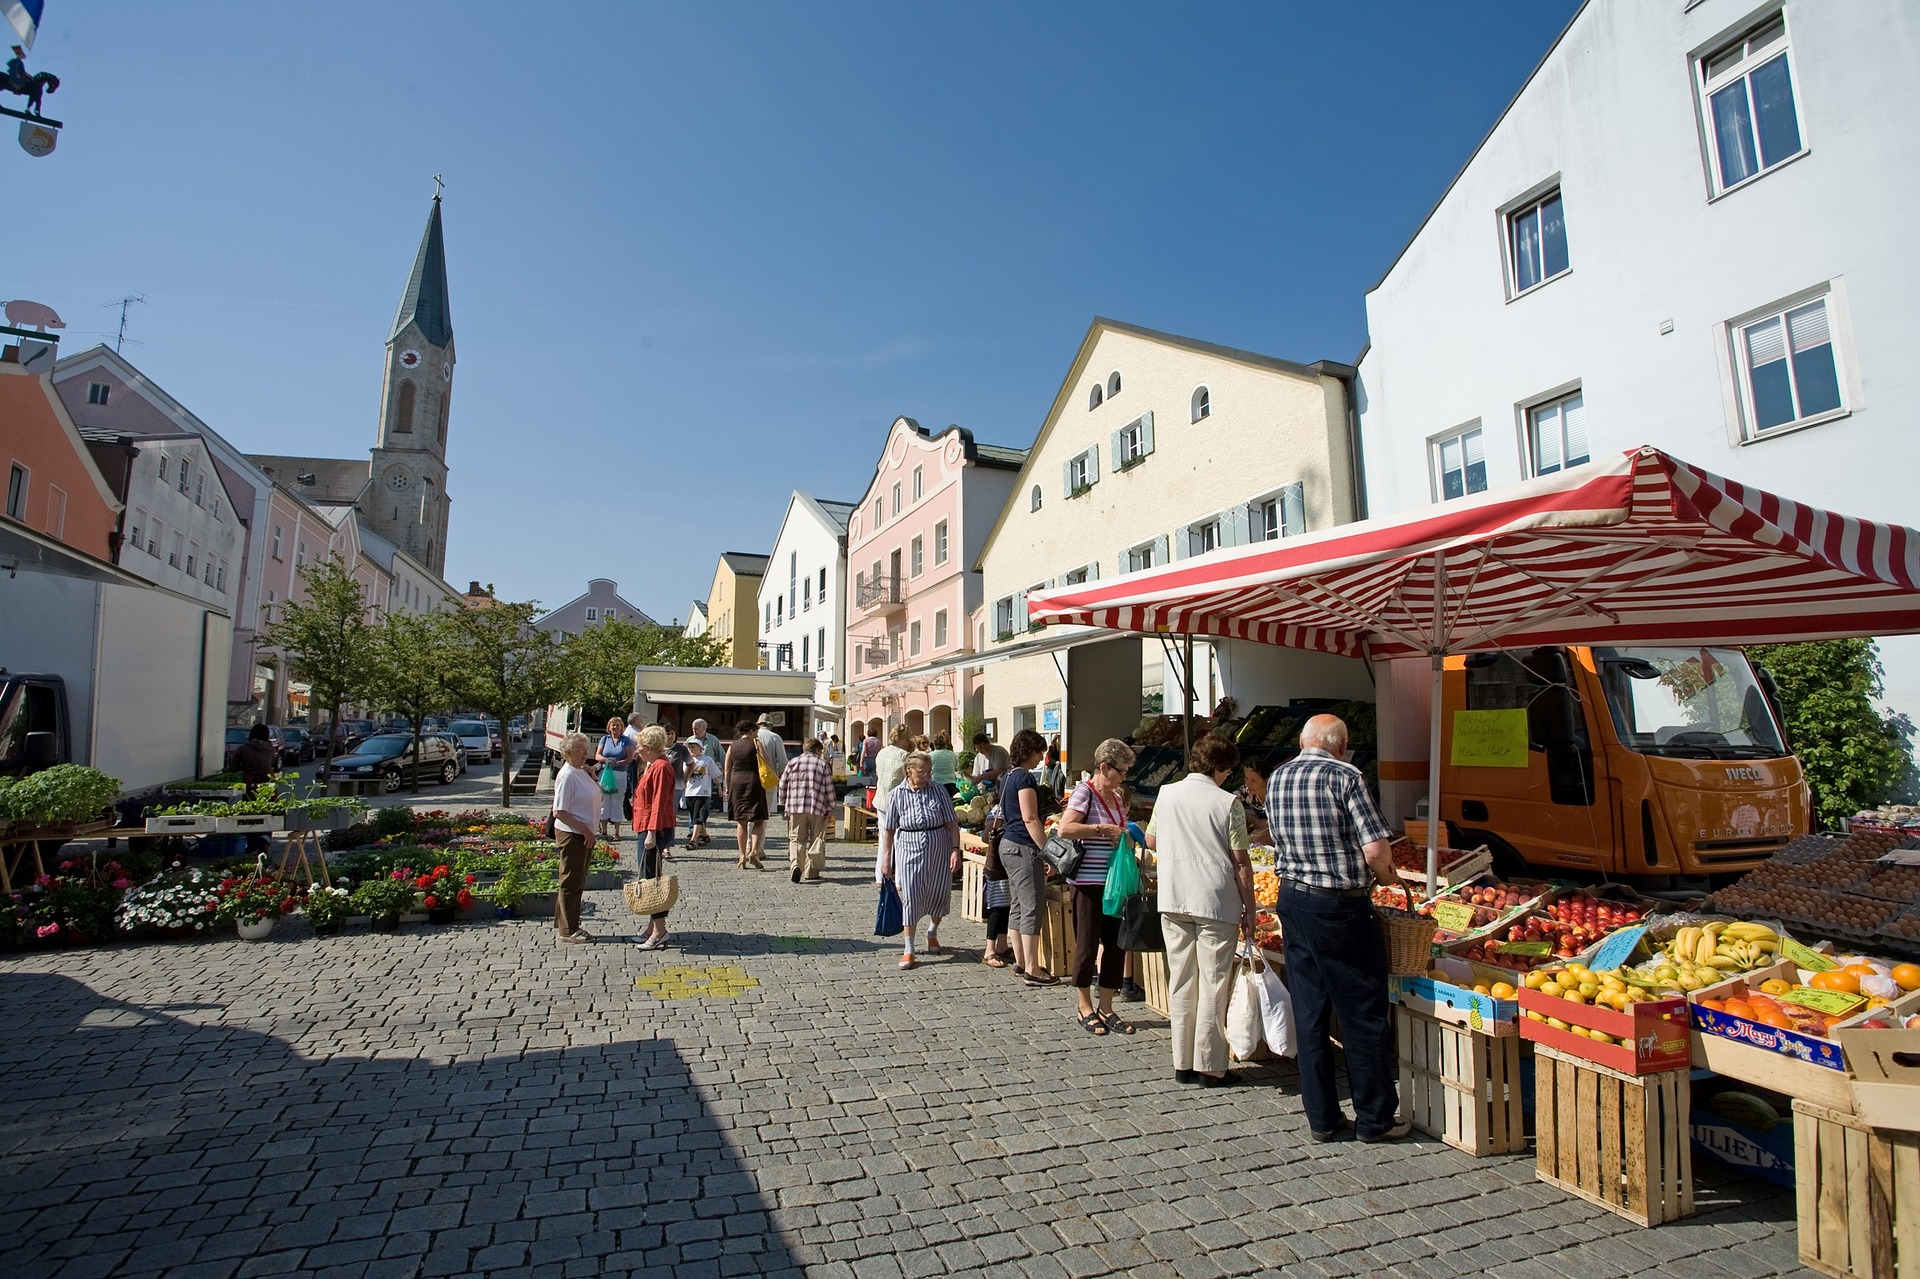 marketplace-836360_1920.jpg